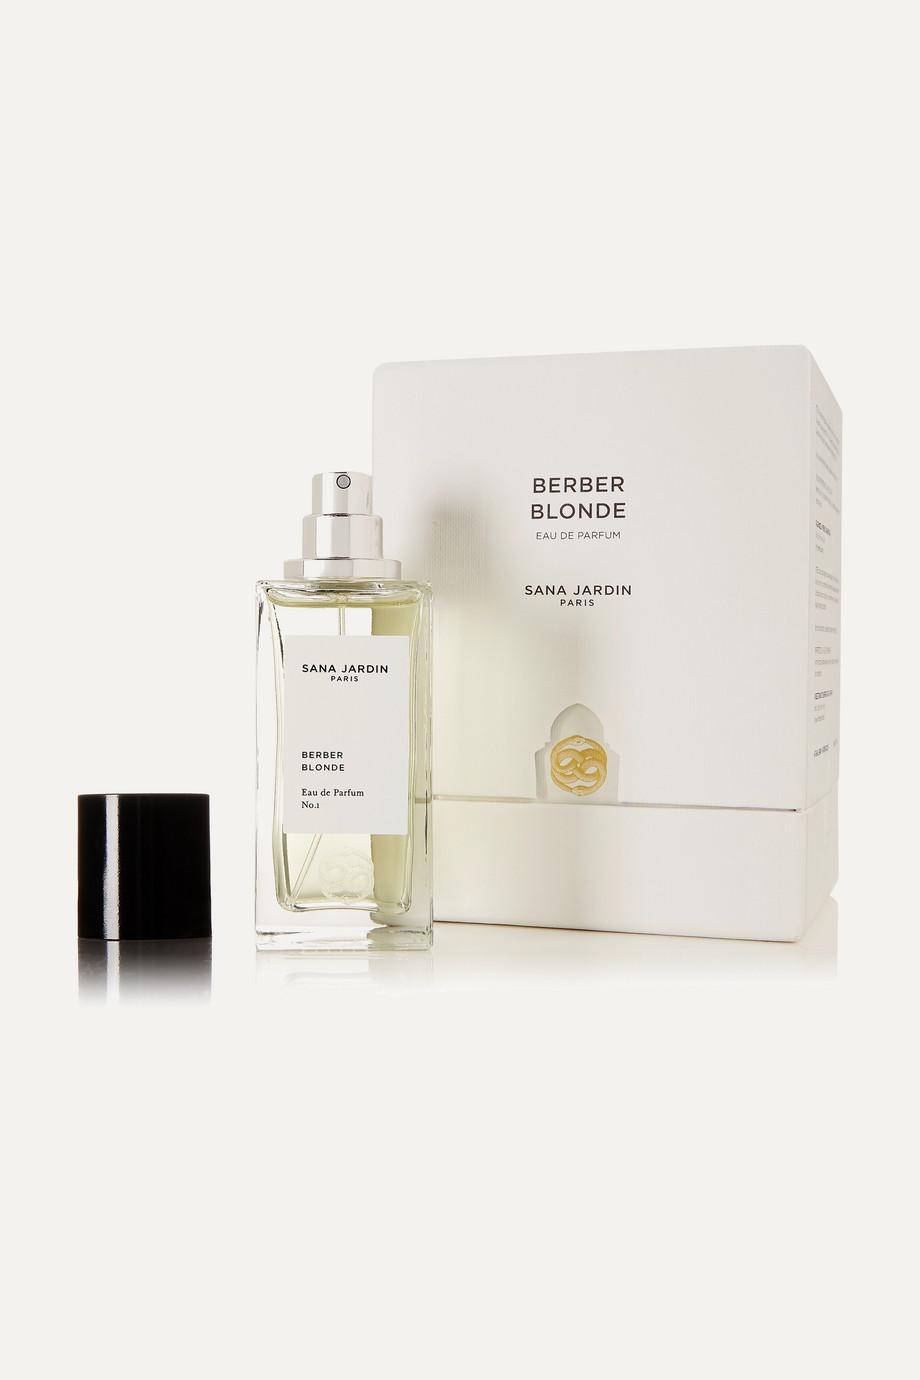 Sana Jardin + NET SUSTAIN Eau de Parfum - Berber Blonde, 50ml